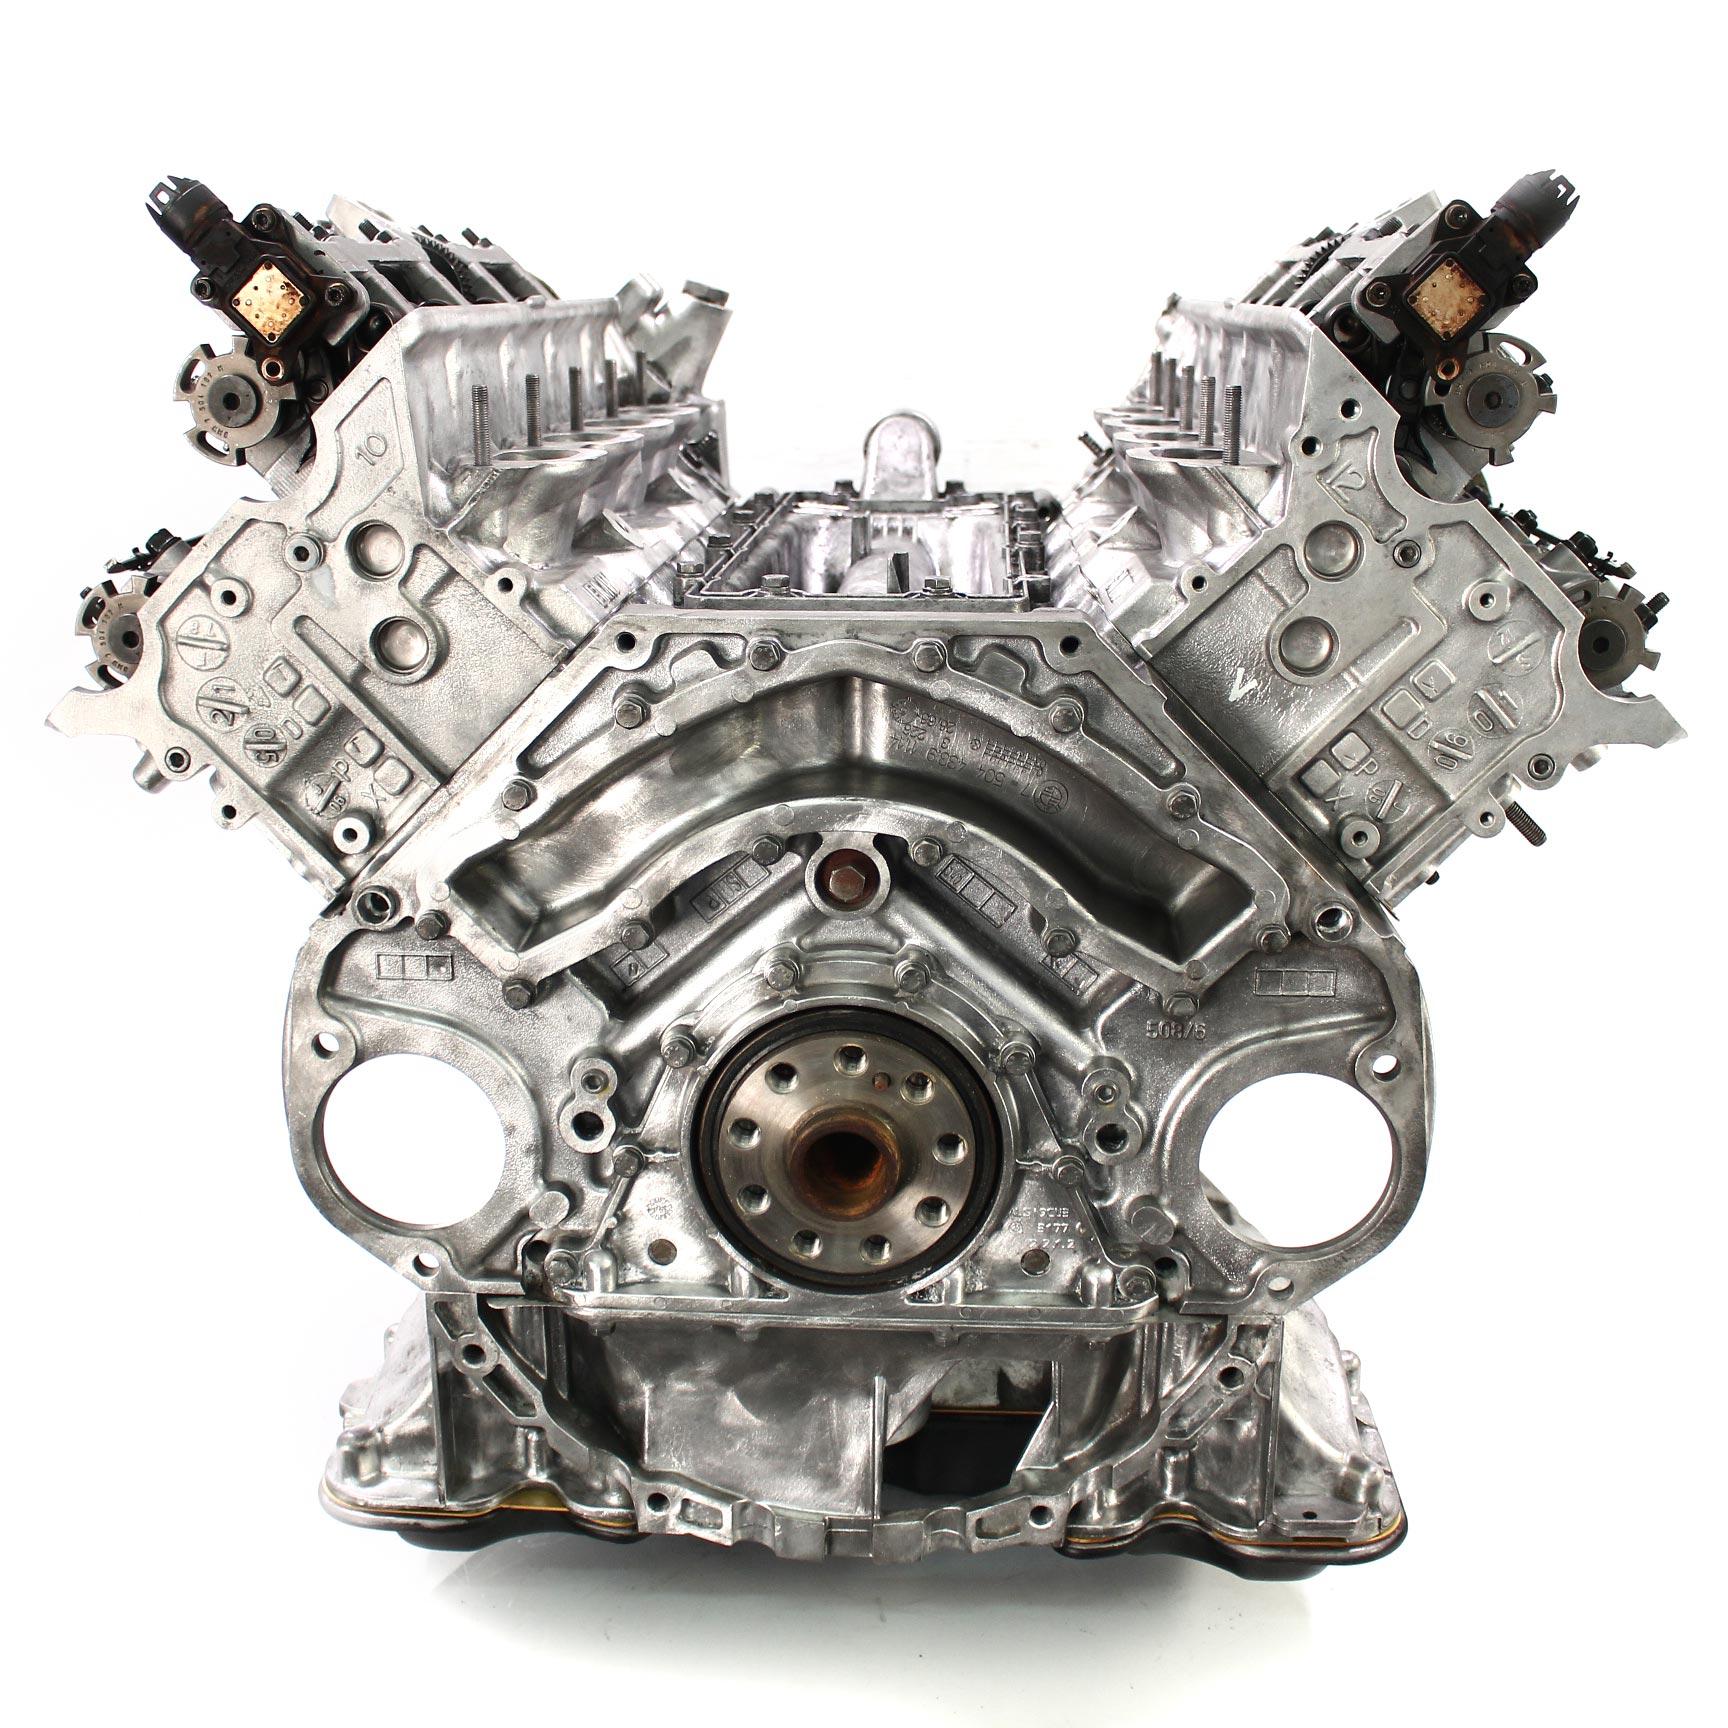 Motor 2006 BMW 7er E65 E66 E67 750 i Li 4,8 Benzin N62B48B N62 367 PS